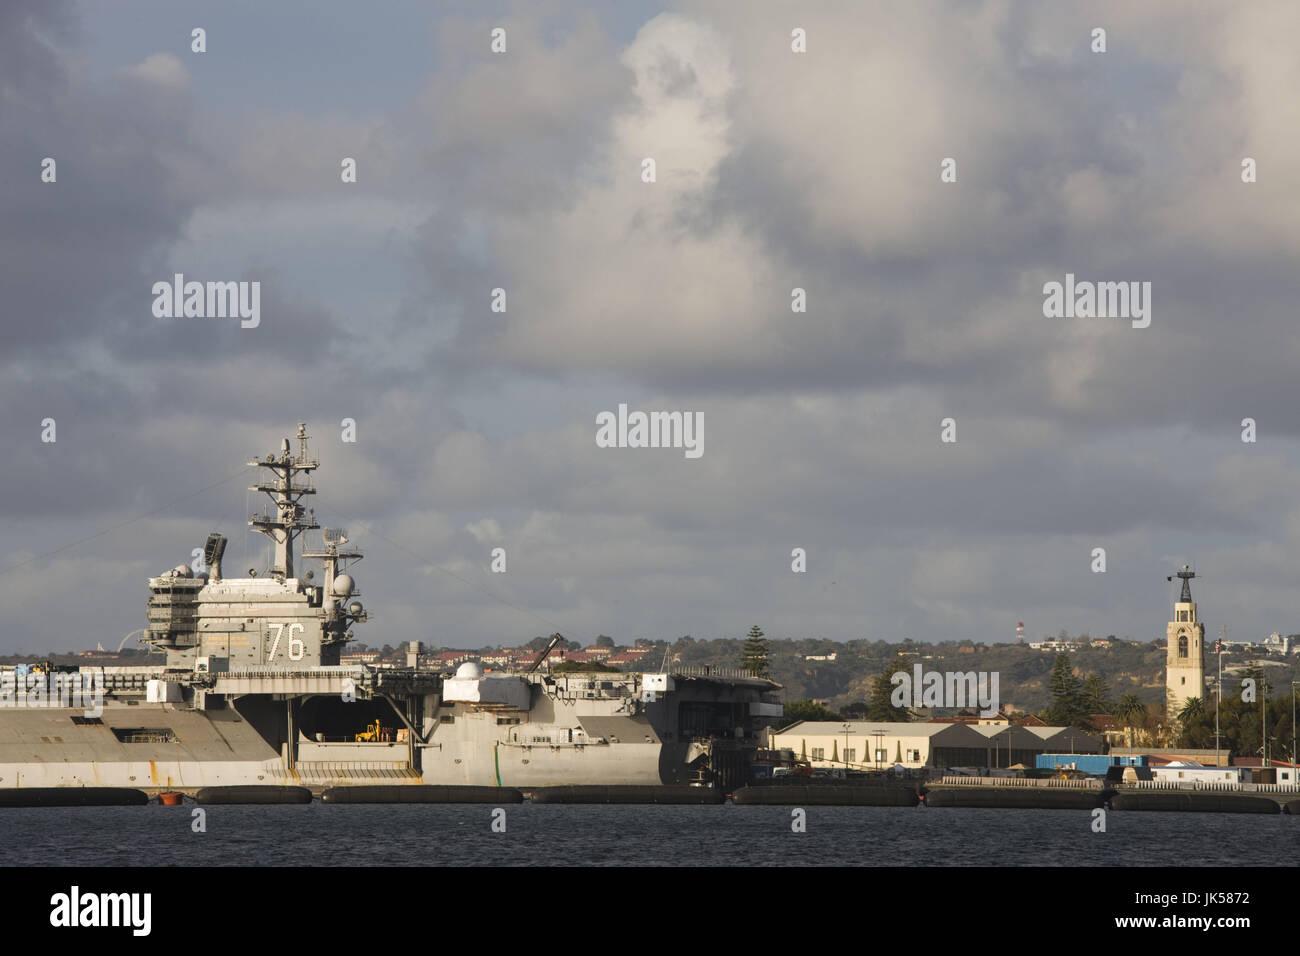 USA, California, San Diego, Aircraft carrier at North Island Naval Base - Stock Image